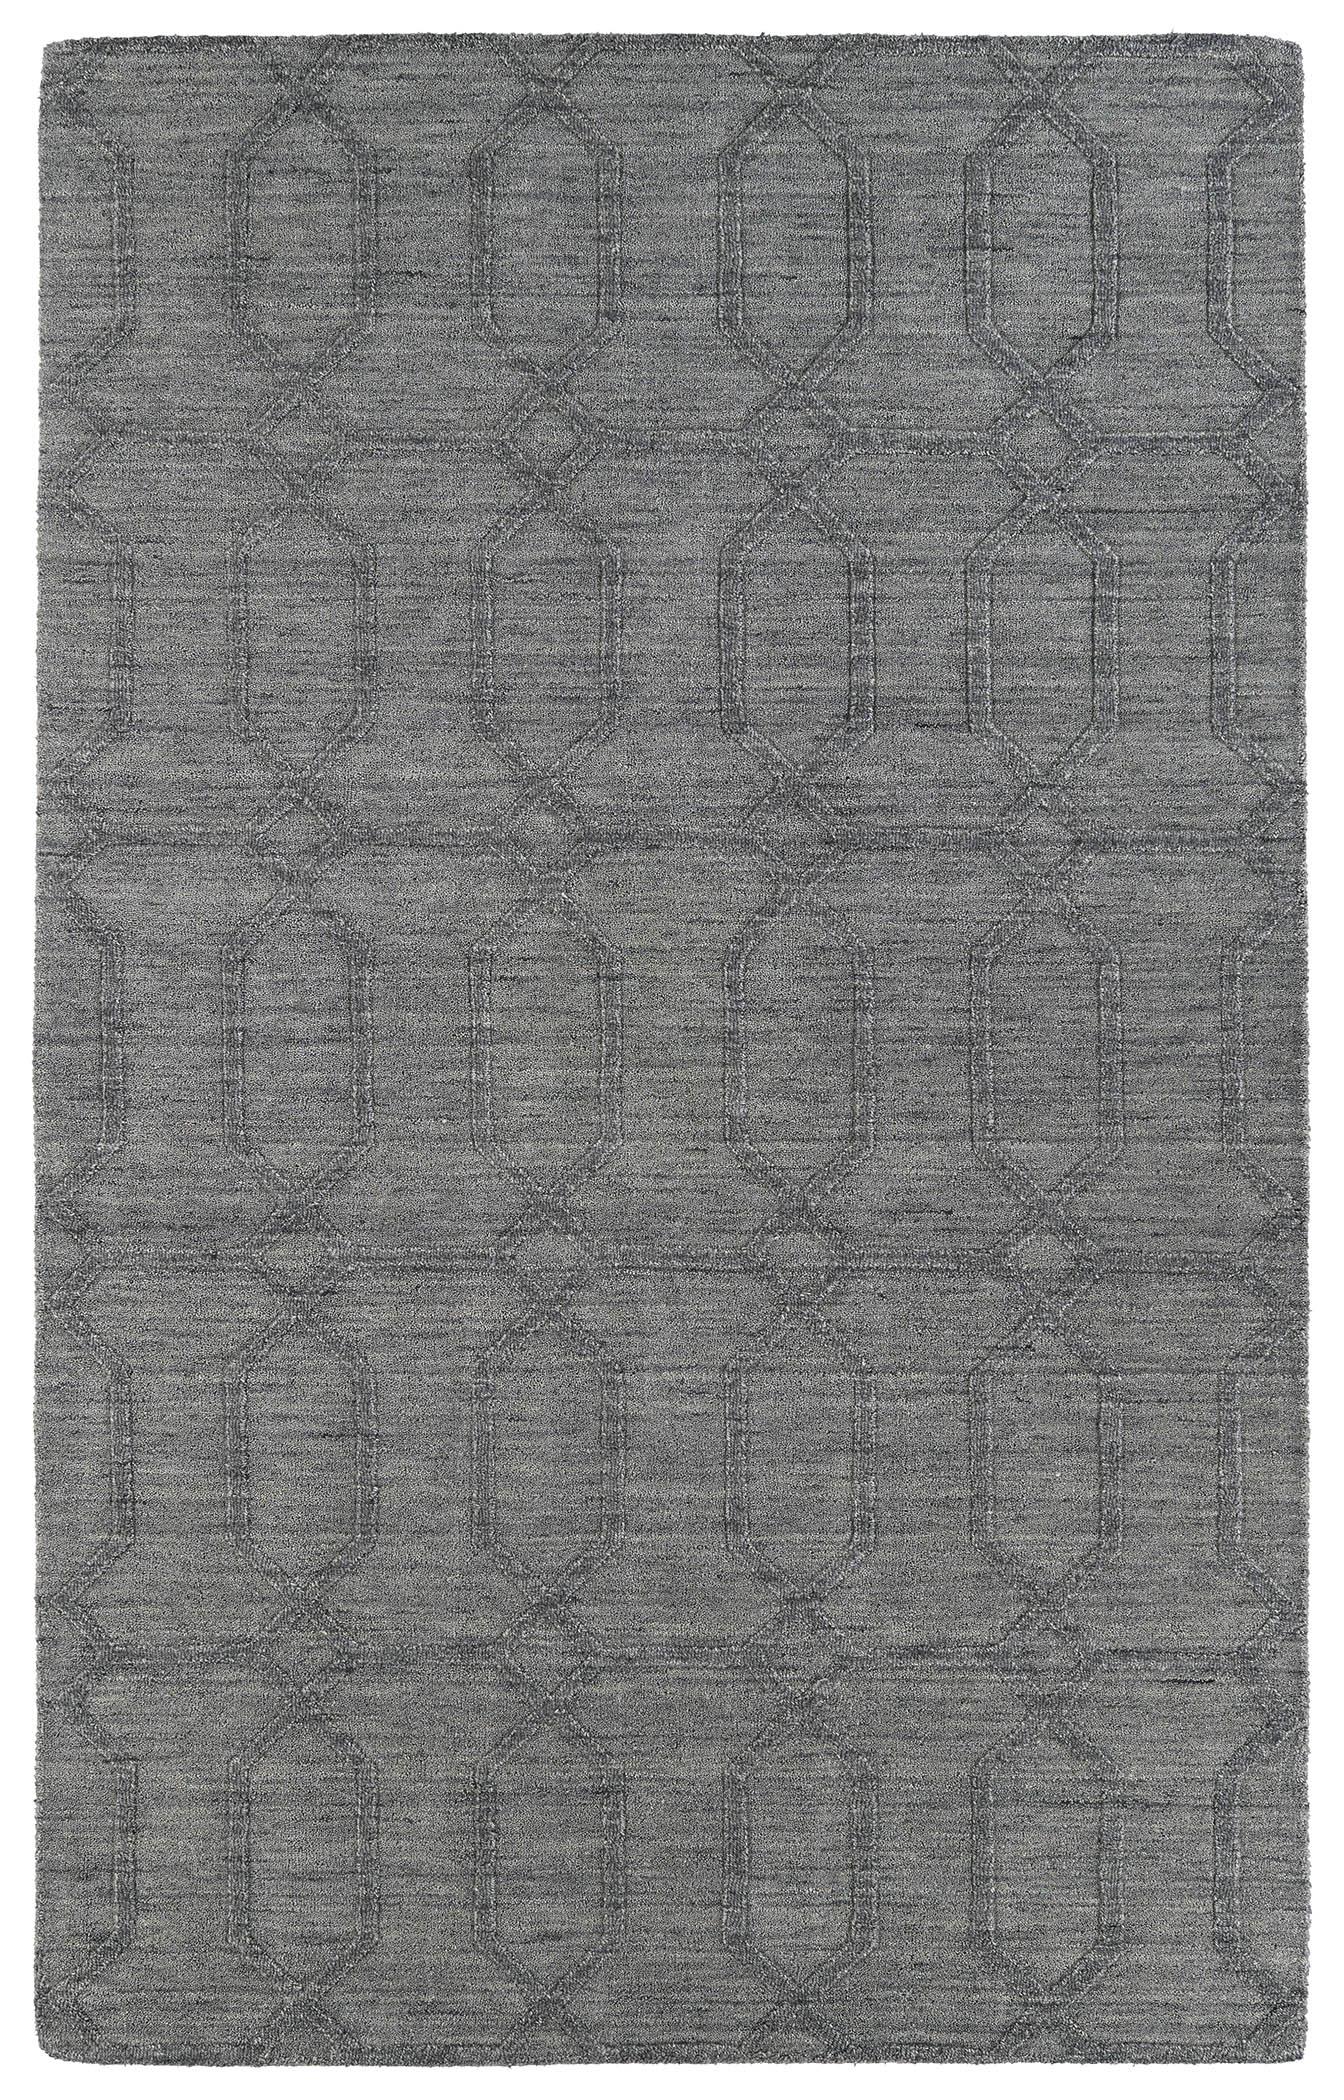 Kaleen Imprints Modern Ipm03 75 Grey Rug